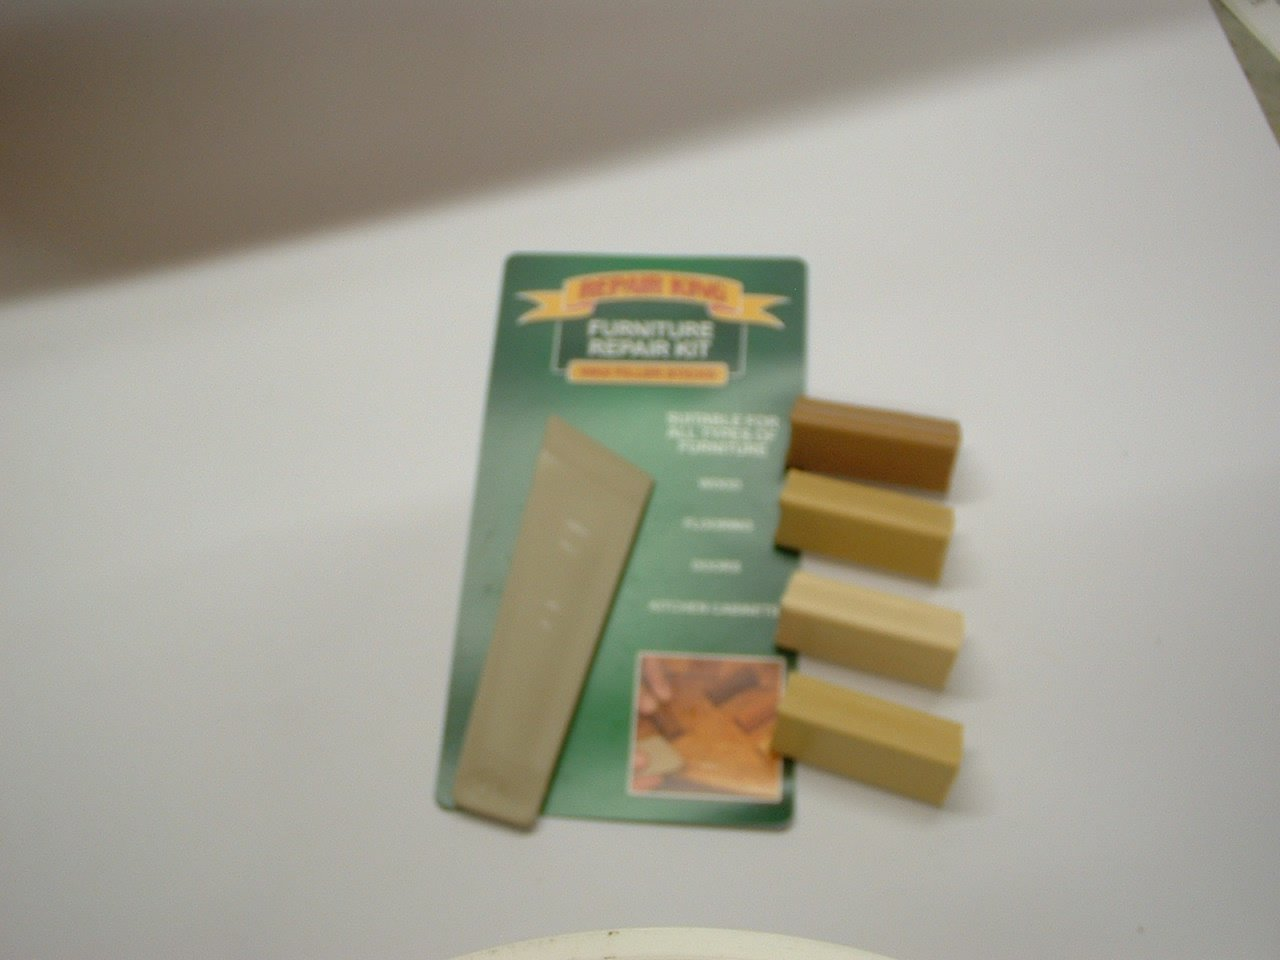 furniture repair kit. 1 x laminate floor worktop furniture repair kit (l) for beech, light warm honey ash, birch, oak, maple, pine, medium s